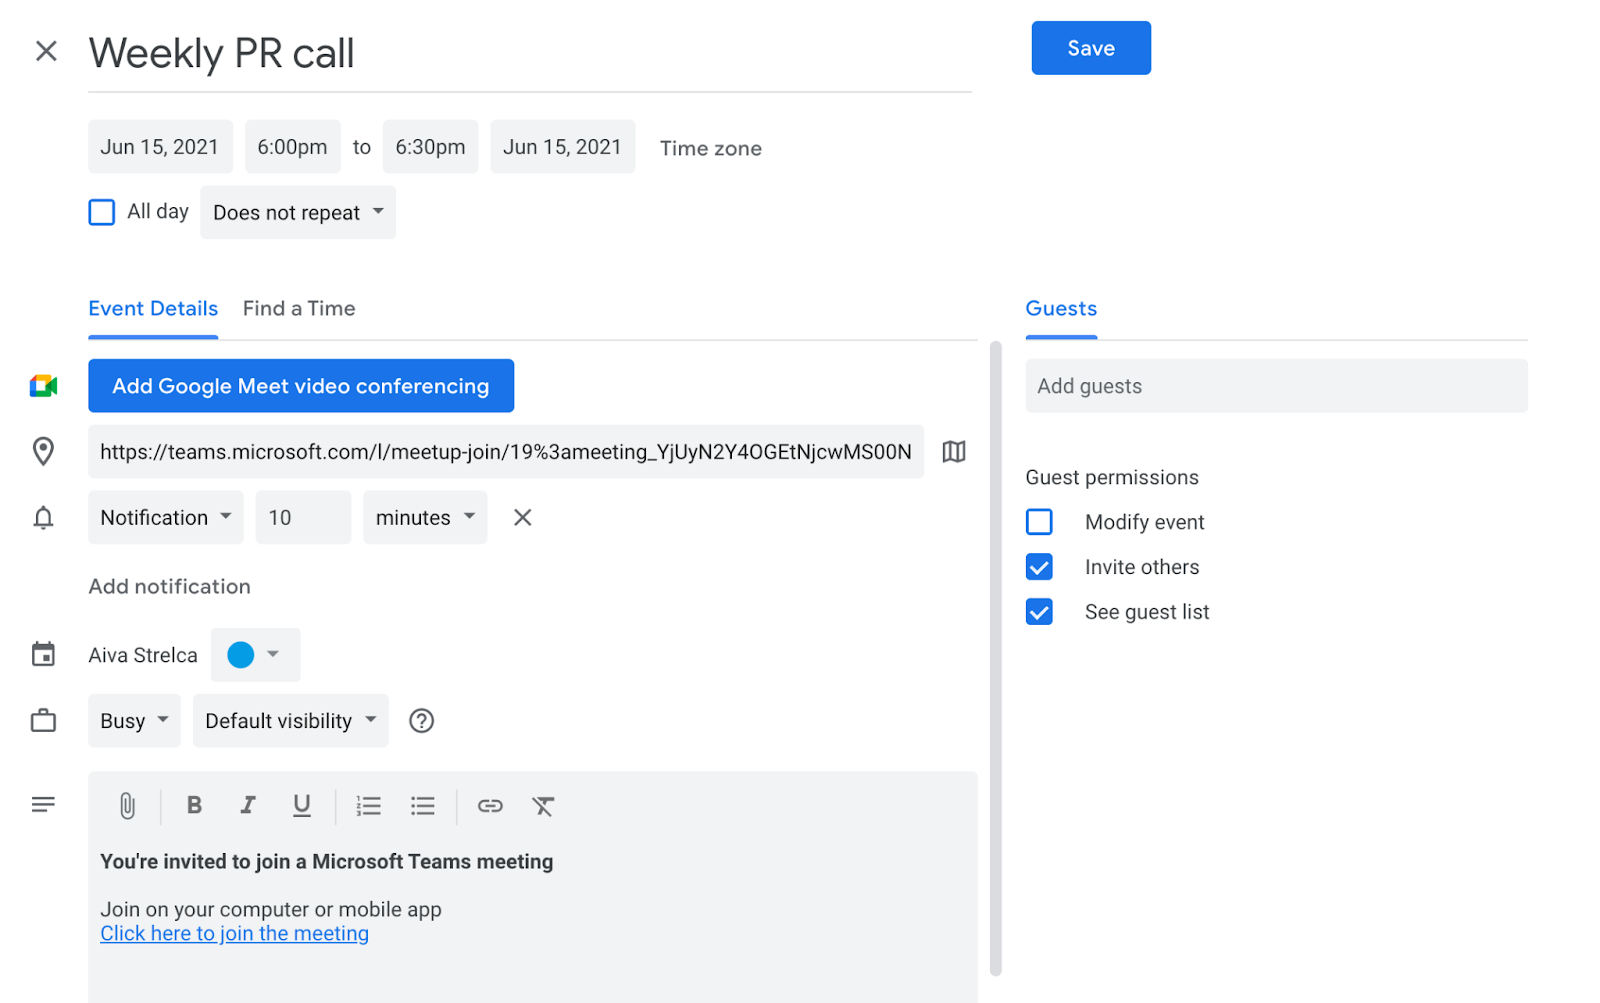 Adding meeting details for Microsoft Teams meeting on Google Calendar